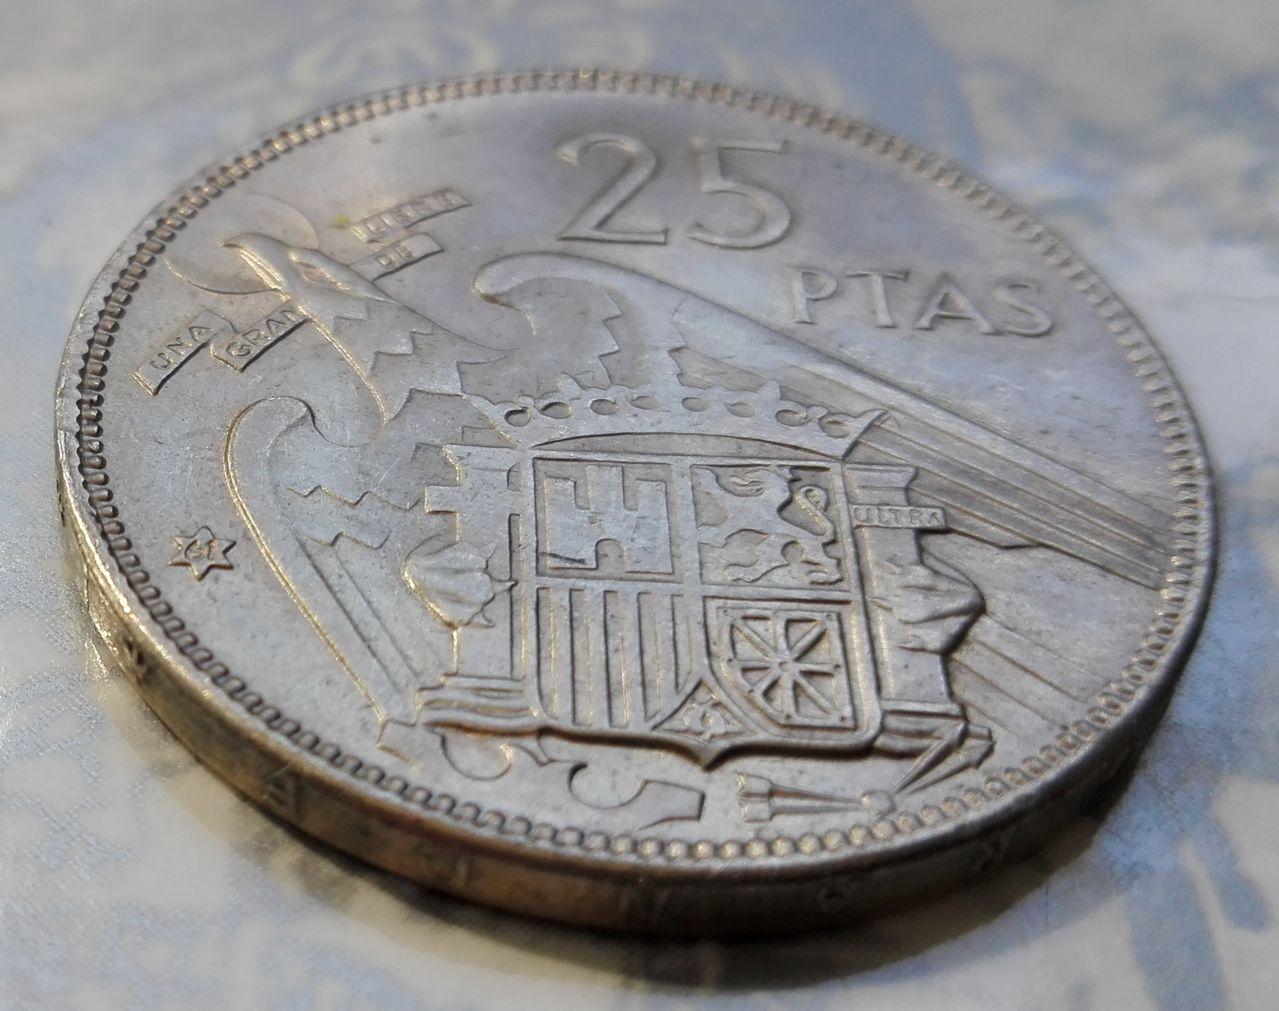 25 pesetas 1957 (*61). Francisco Franco. Dedicada a Estrella76 25_pesetas_63_4